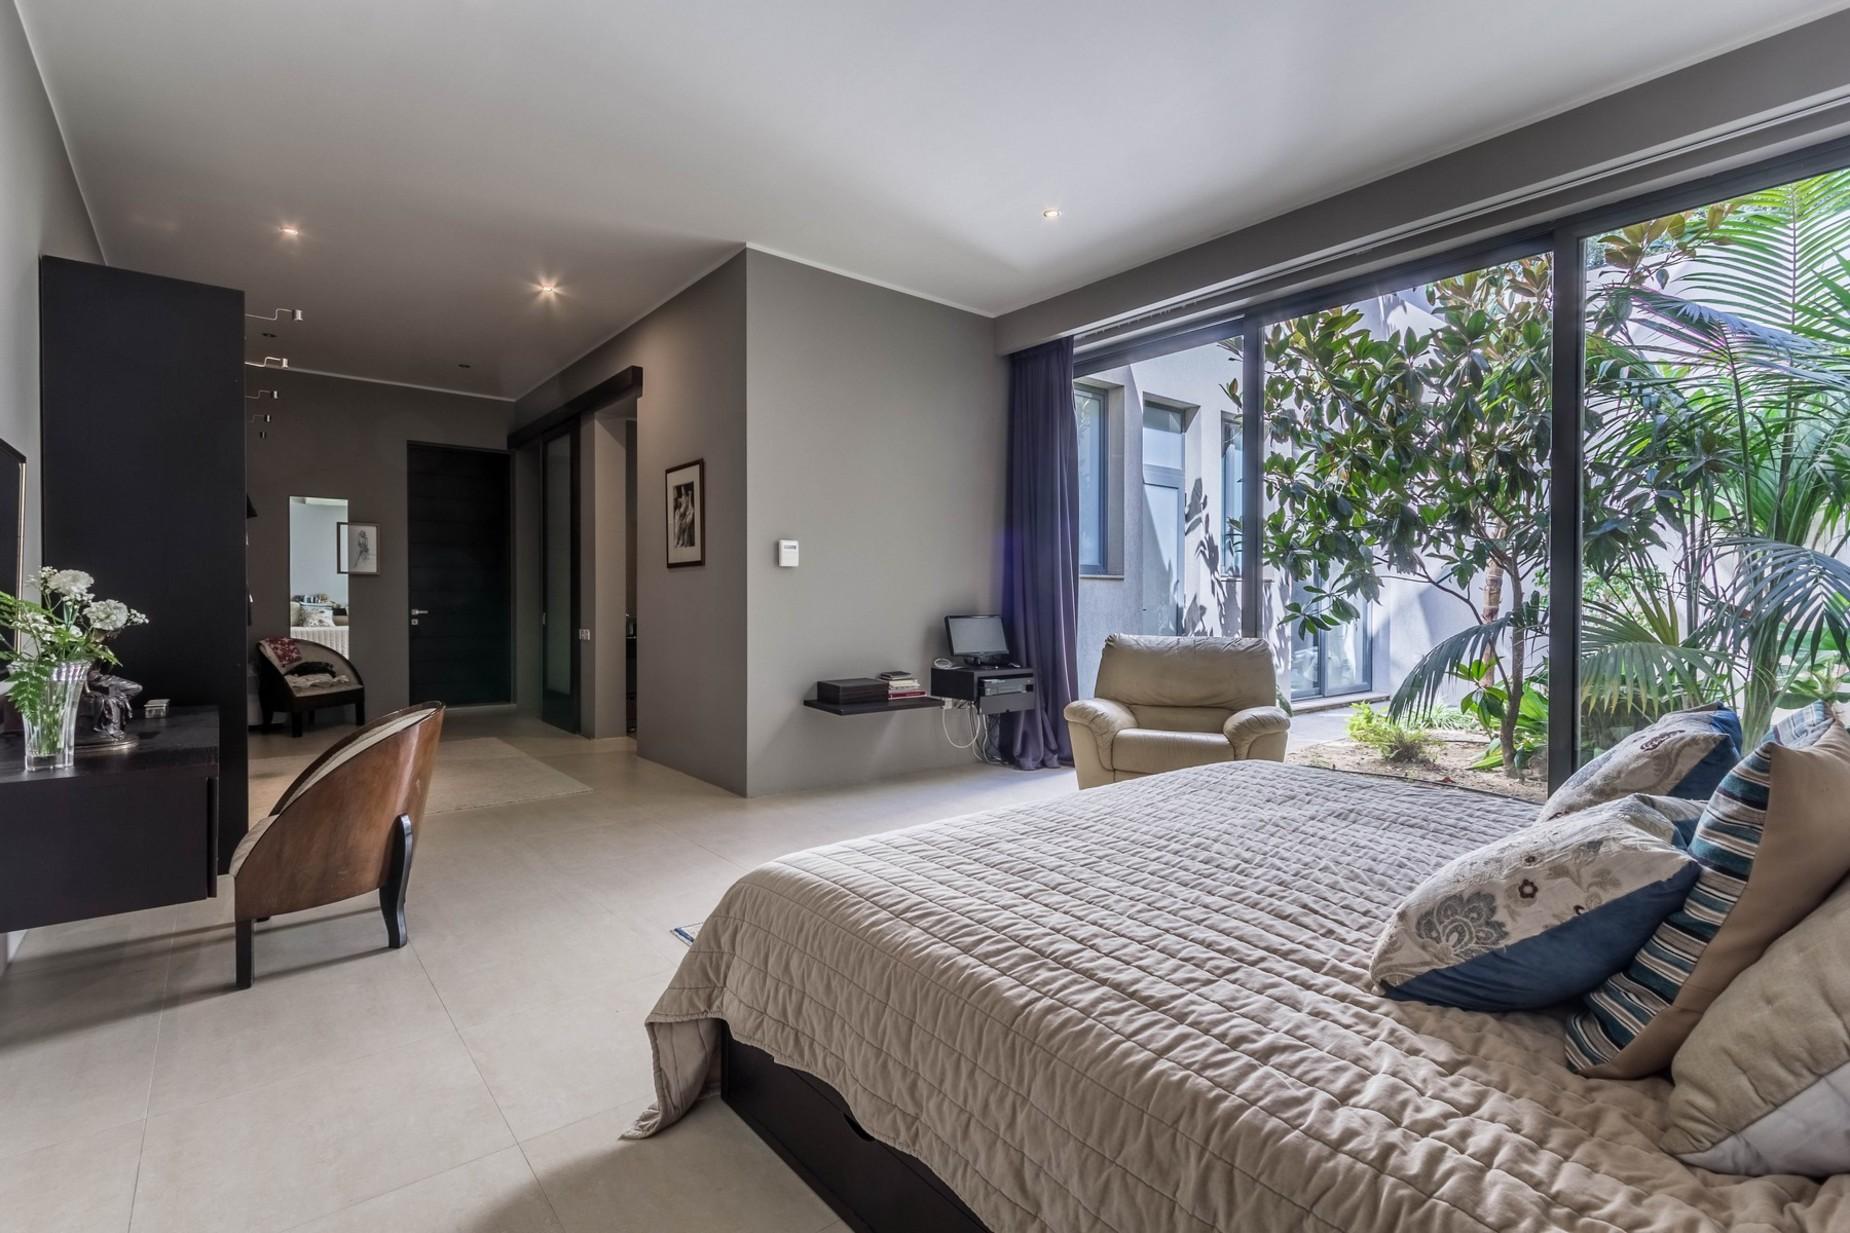 4 bed Villa For Rent in Iklin, Iklin - thumb 13